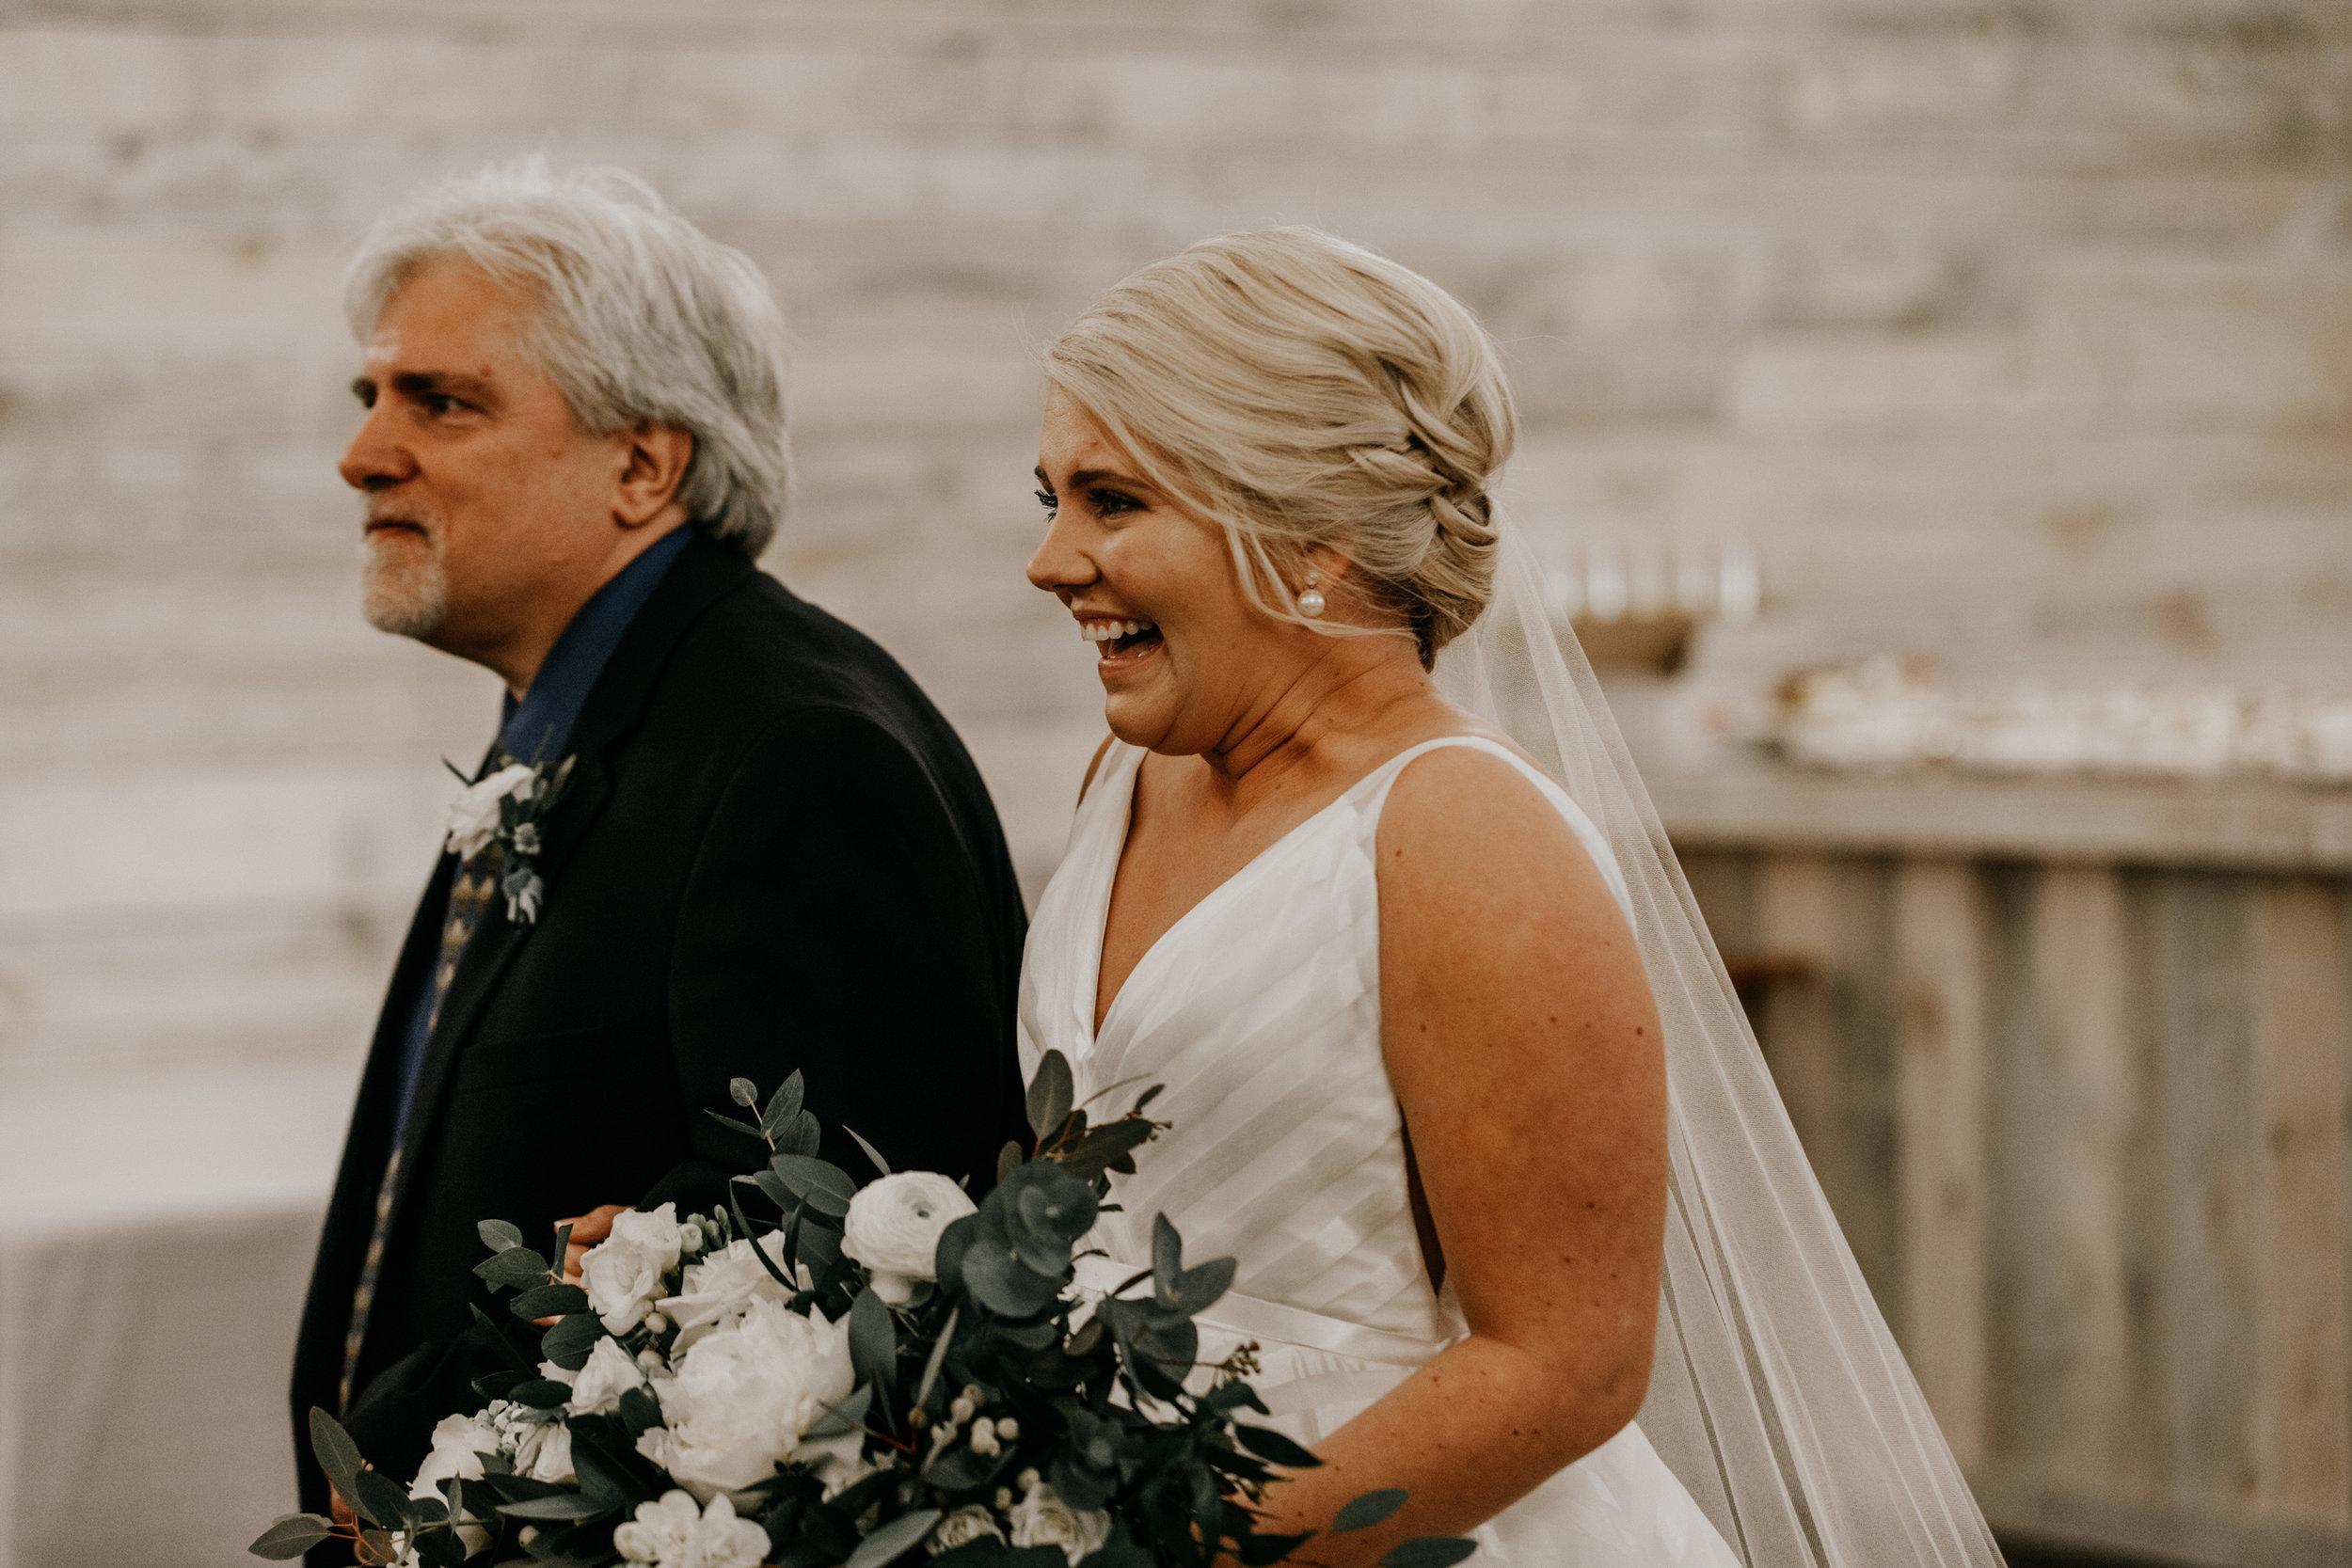 BestweddingphotographerinLosAngeles.jpg